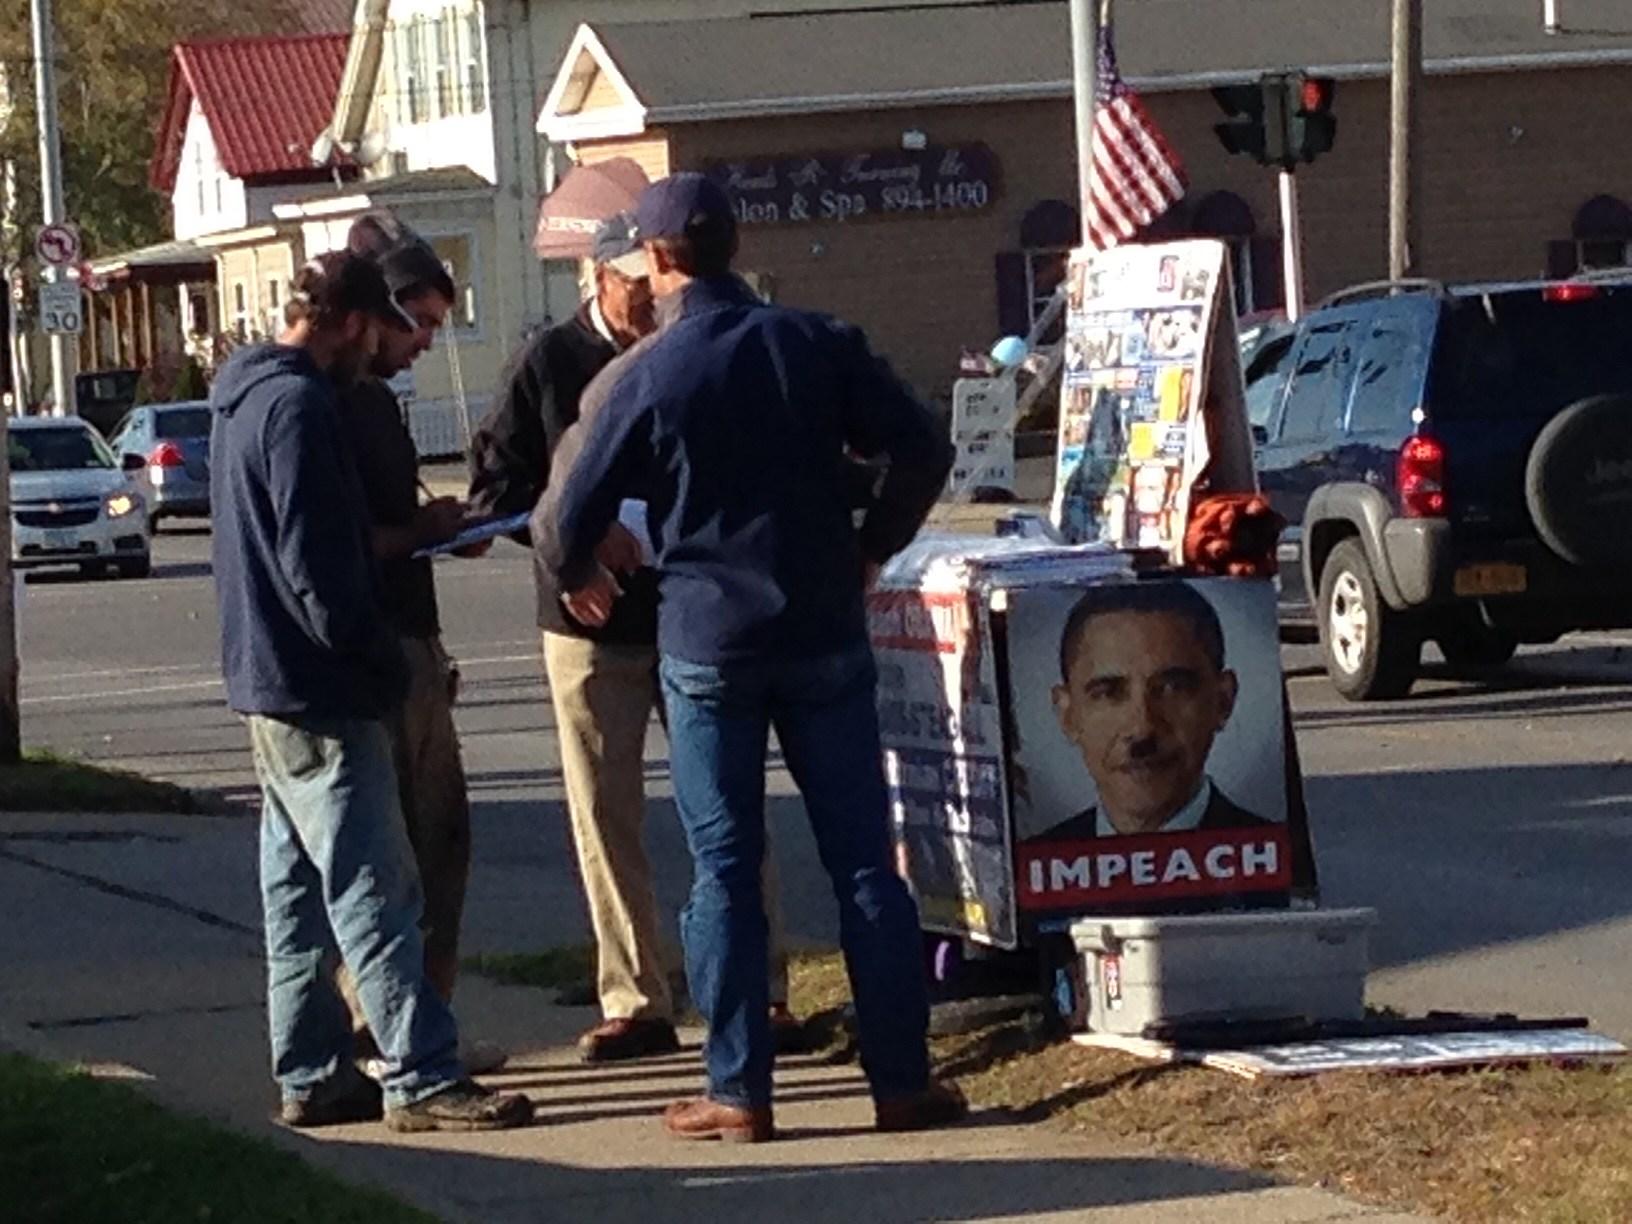 Obama Protest Ilion